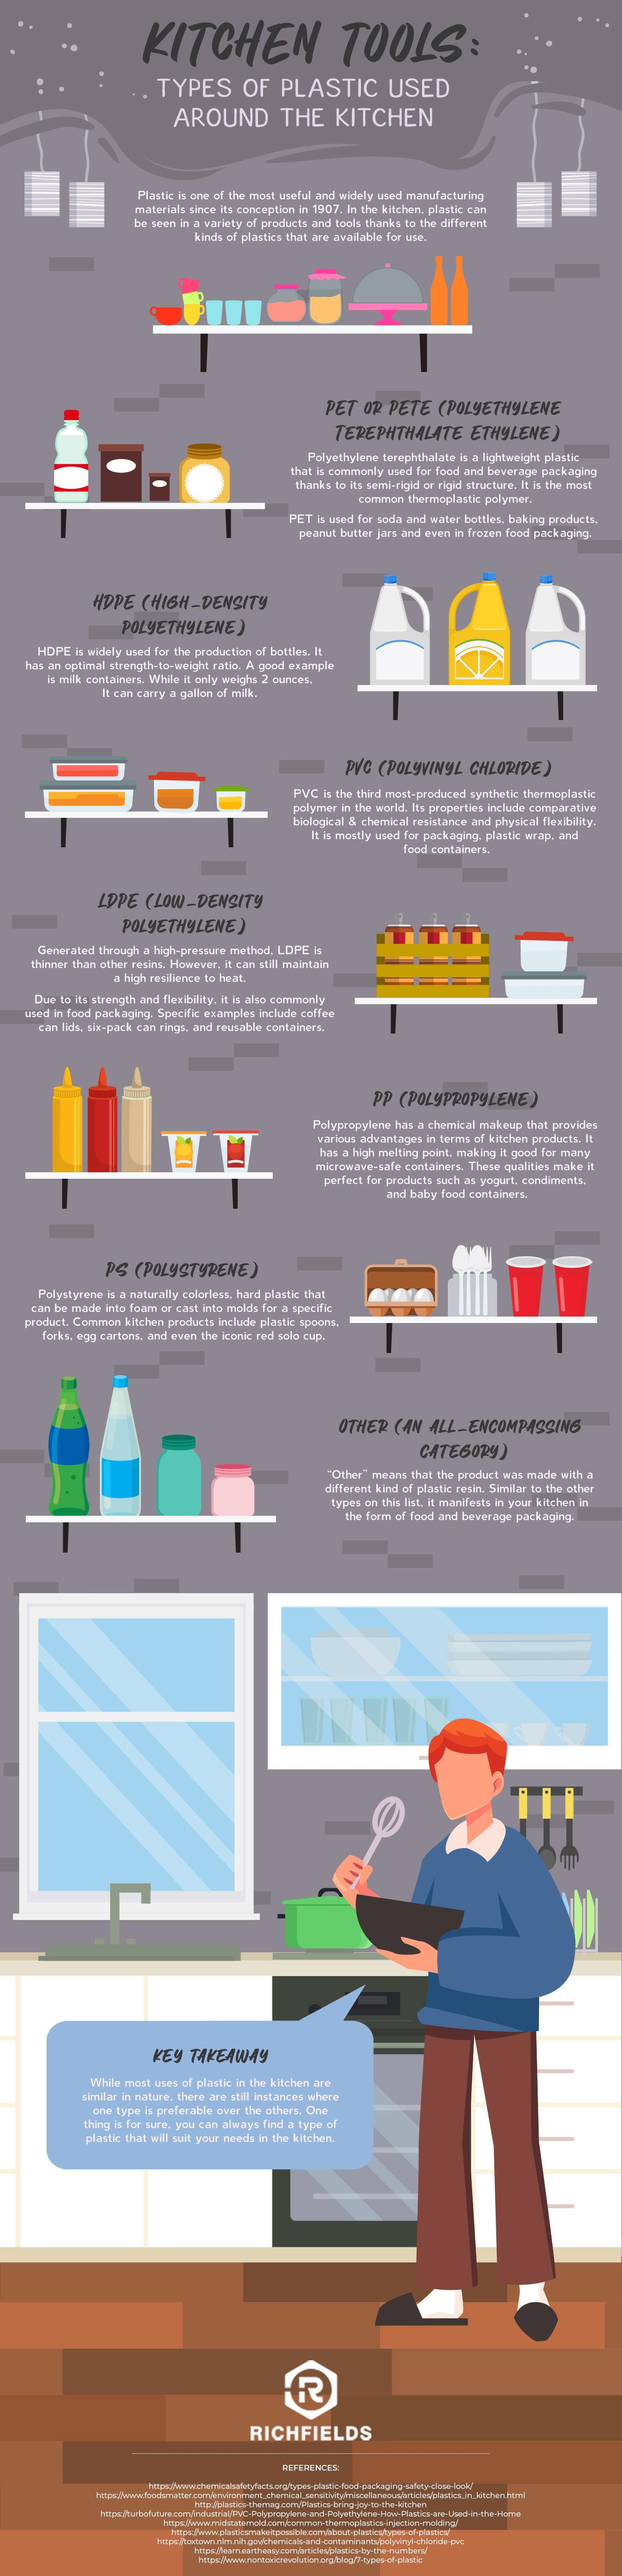 Kitchen Tools: Types of Plastic Used Around the Kitchen